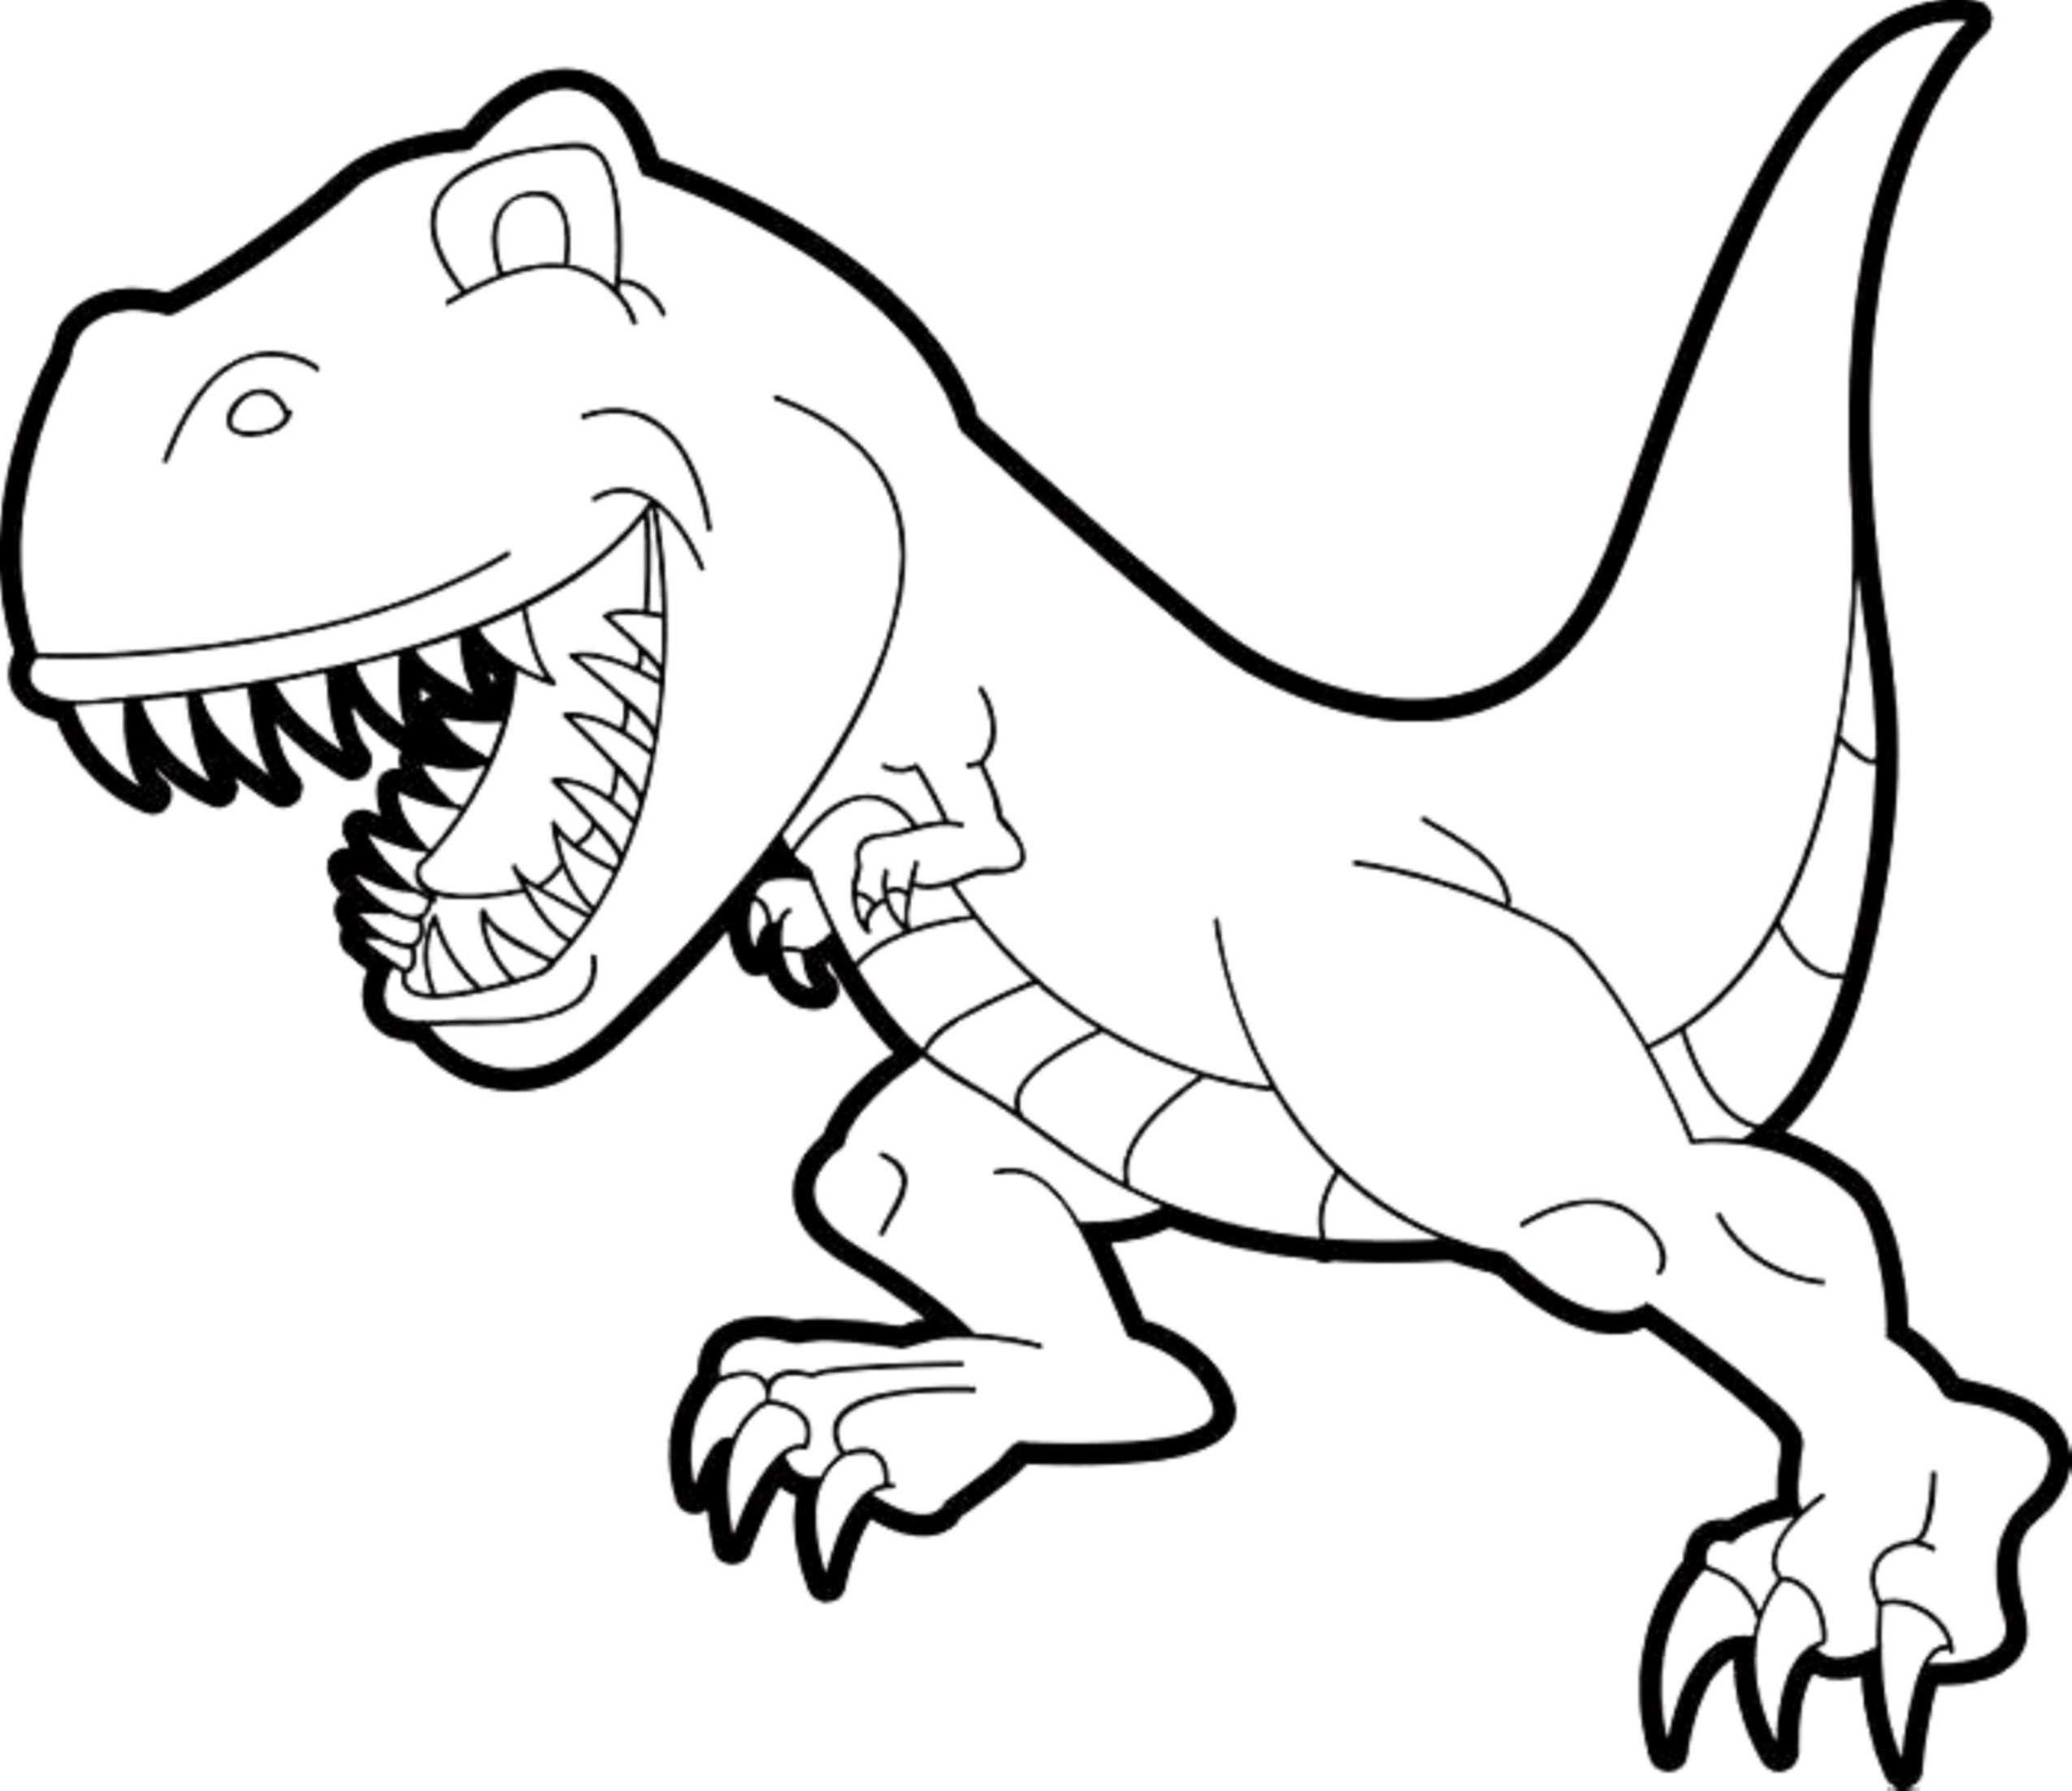 10 printable t rex dinosaur pictures, printable t rex